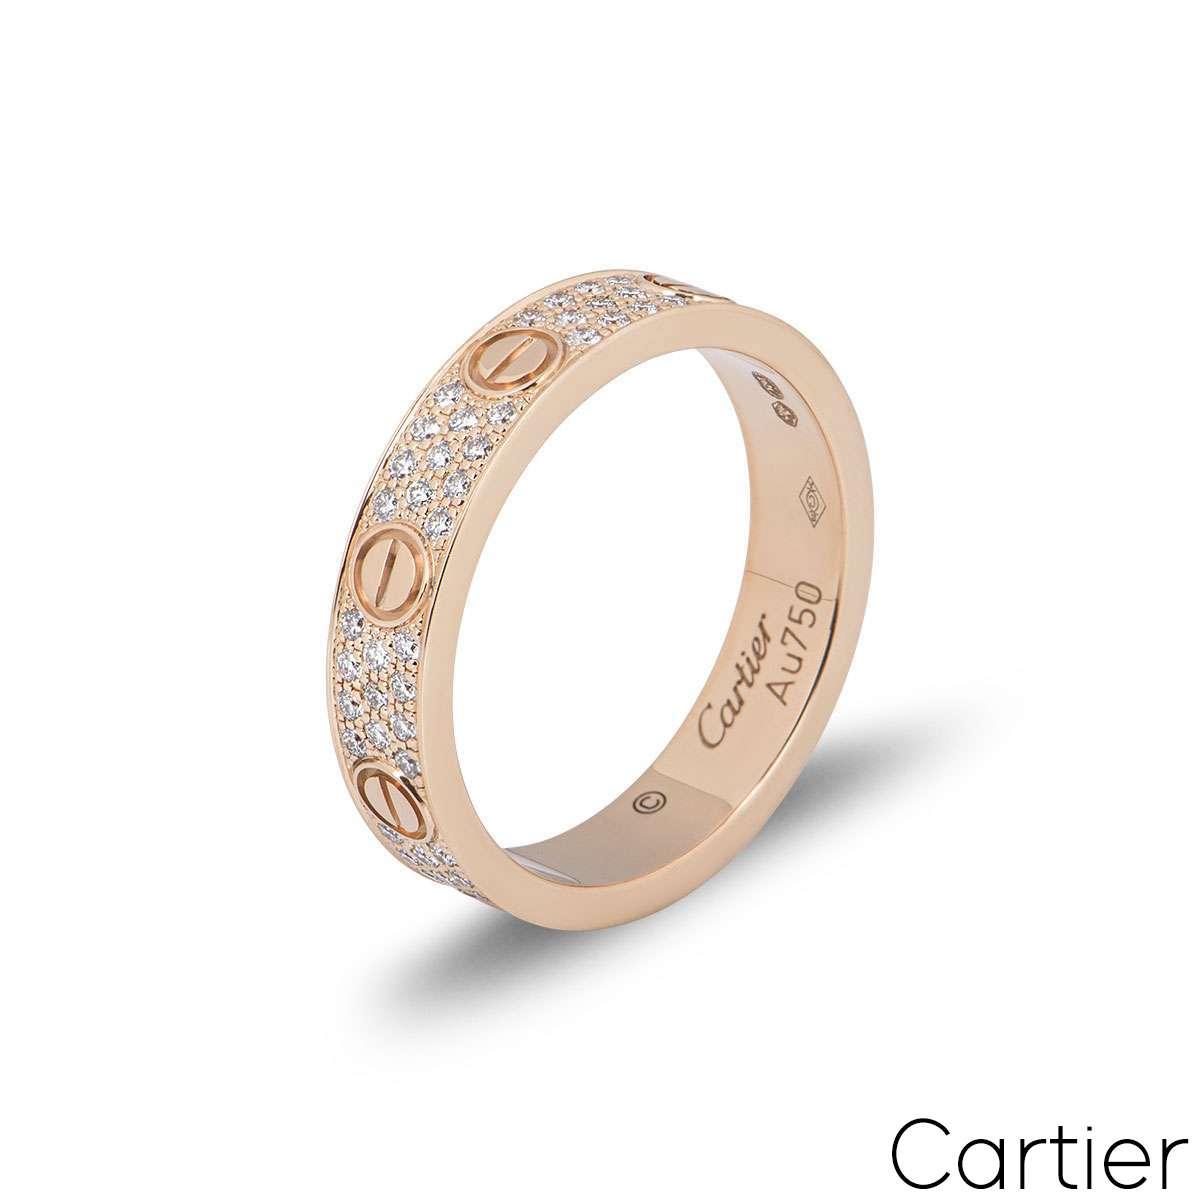 Cartier Rose Gold Pave Diamond Wedding Love Ring Size 53 B4085800